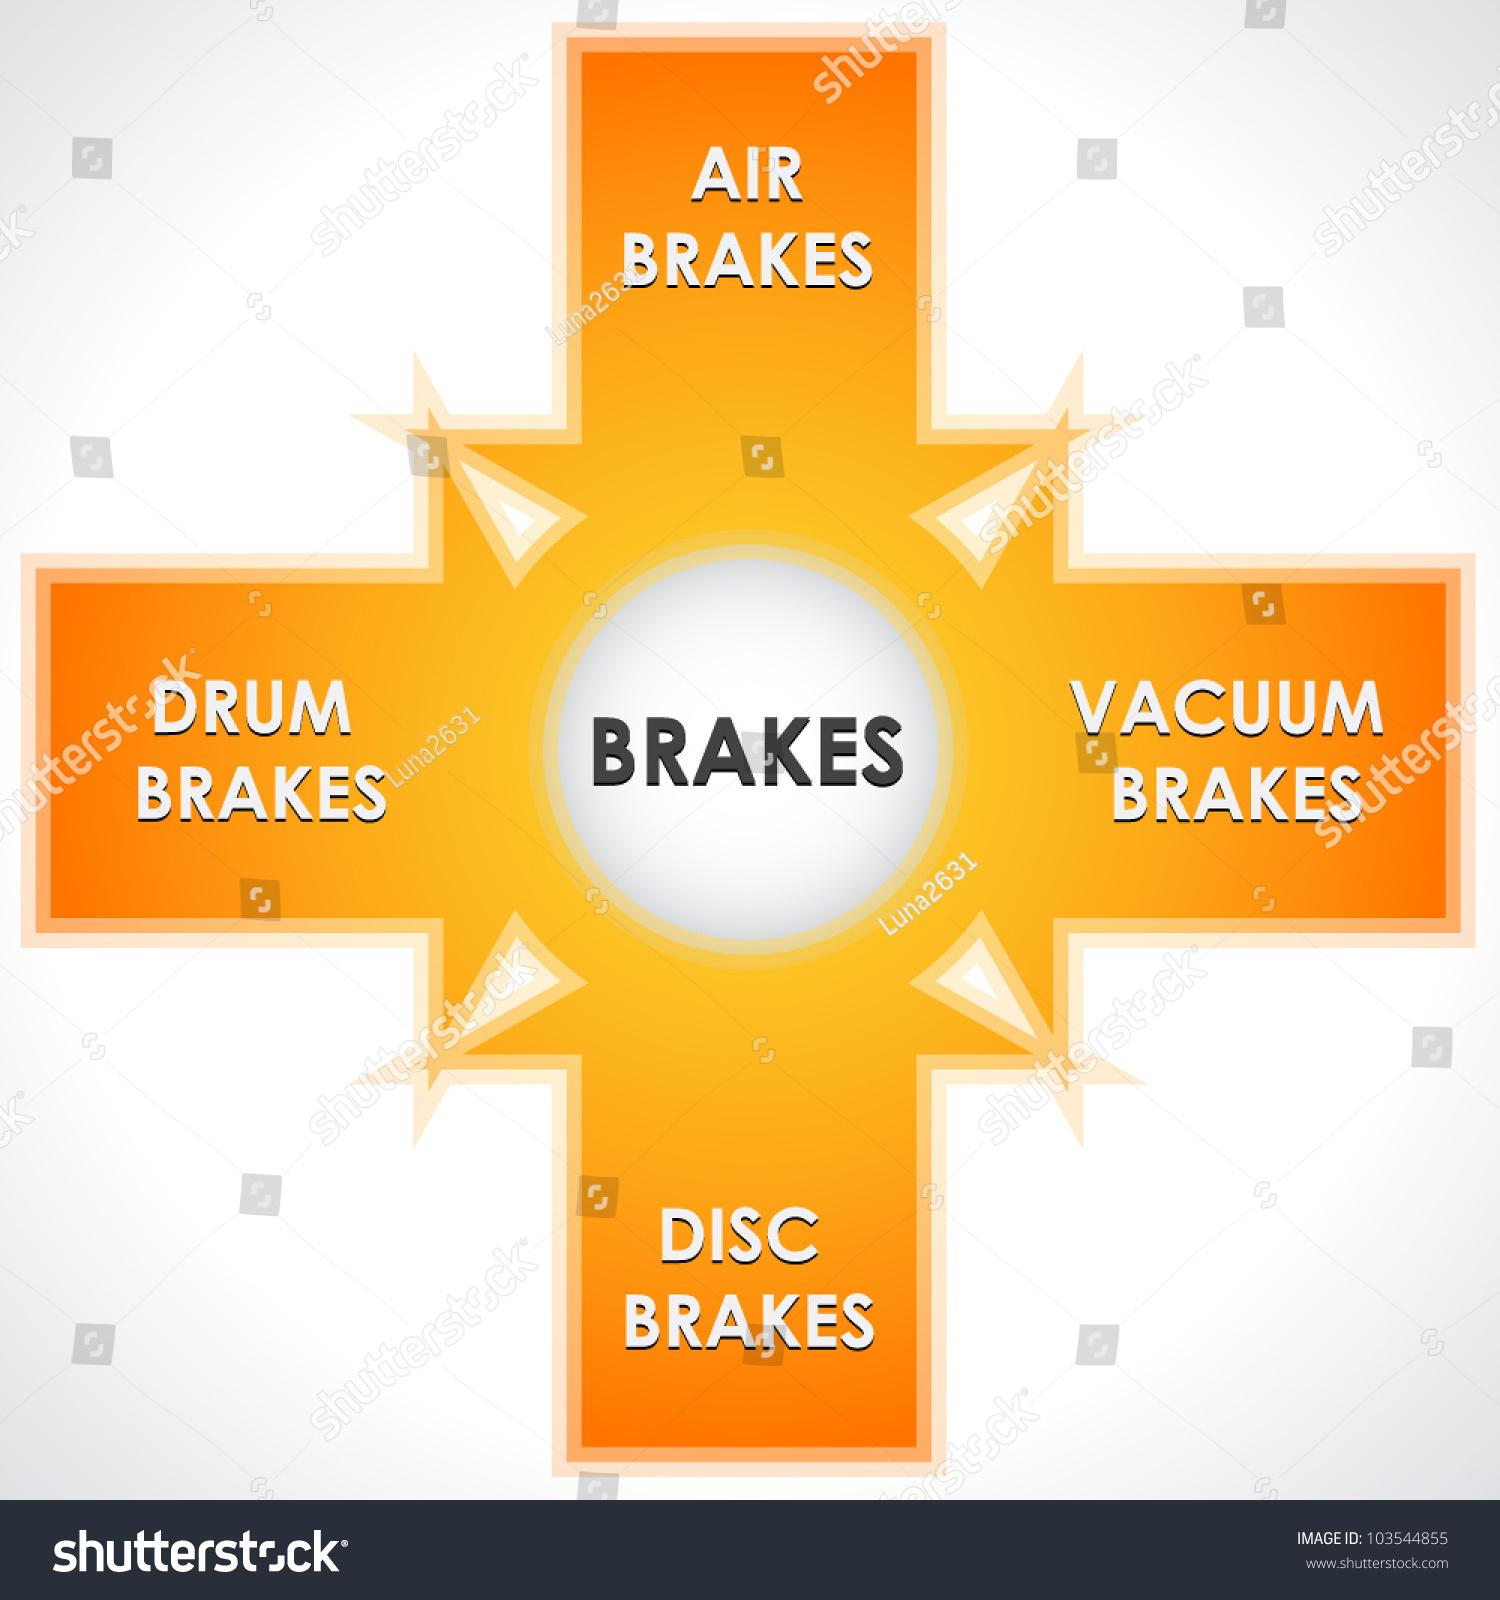 Main types brakes diagram stock vector 2018 103544855 shutterstock the main types of brakes diagram ccuart Images